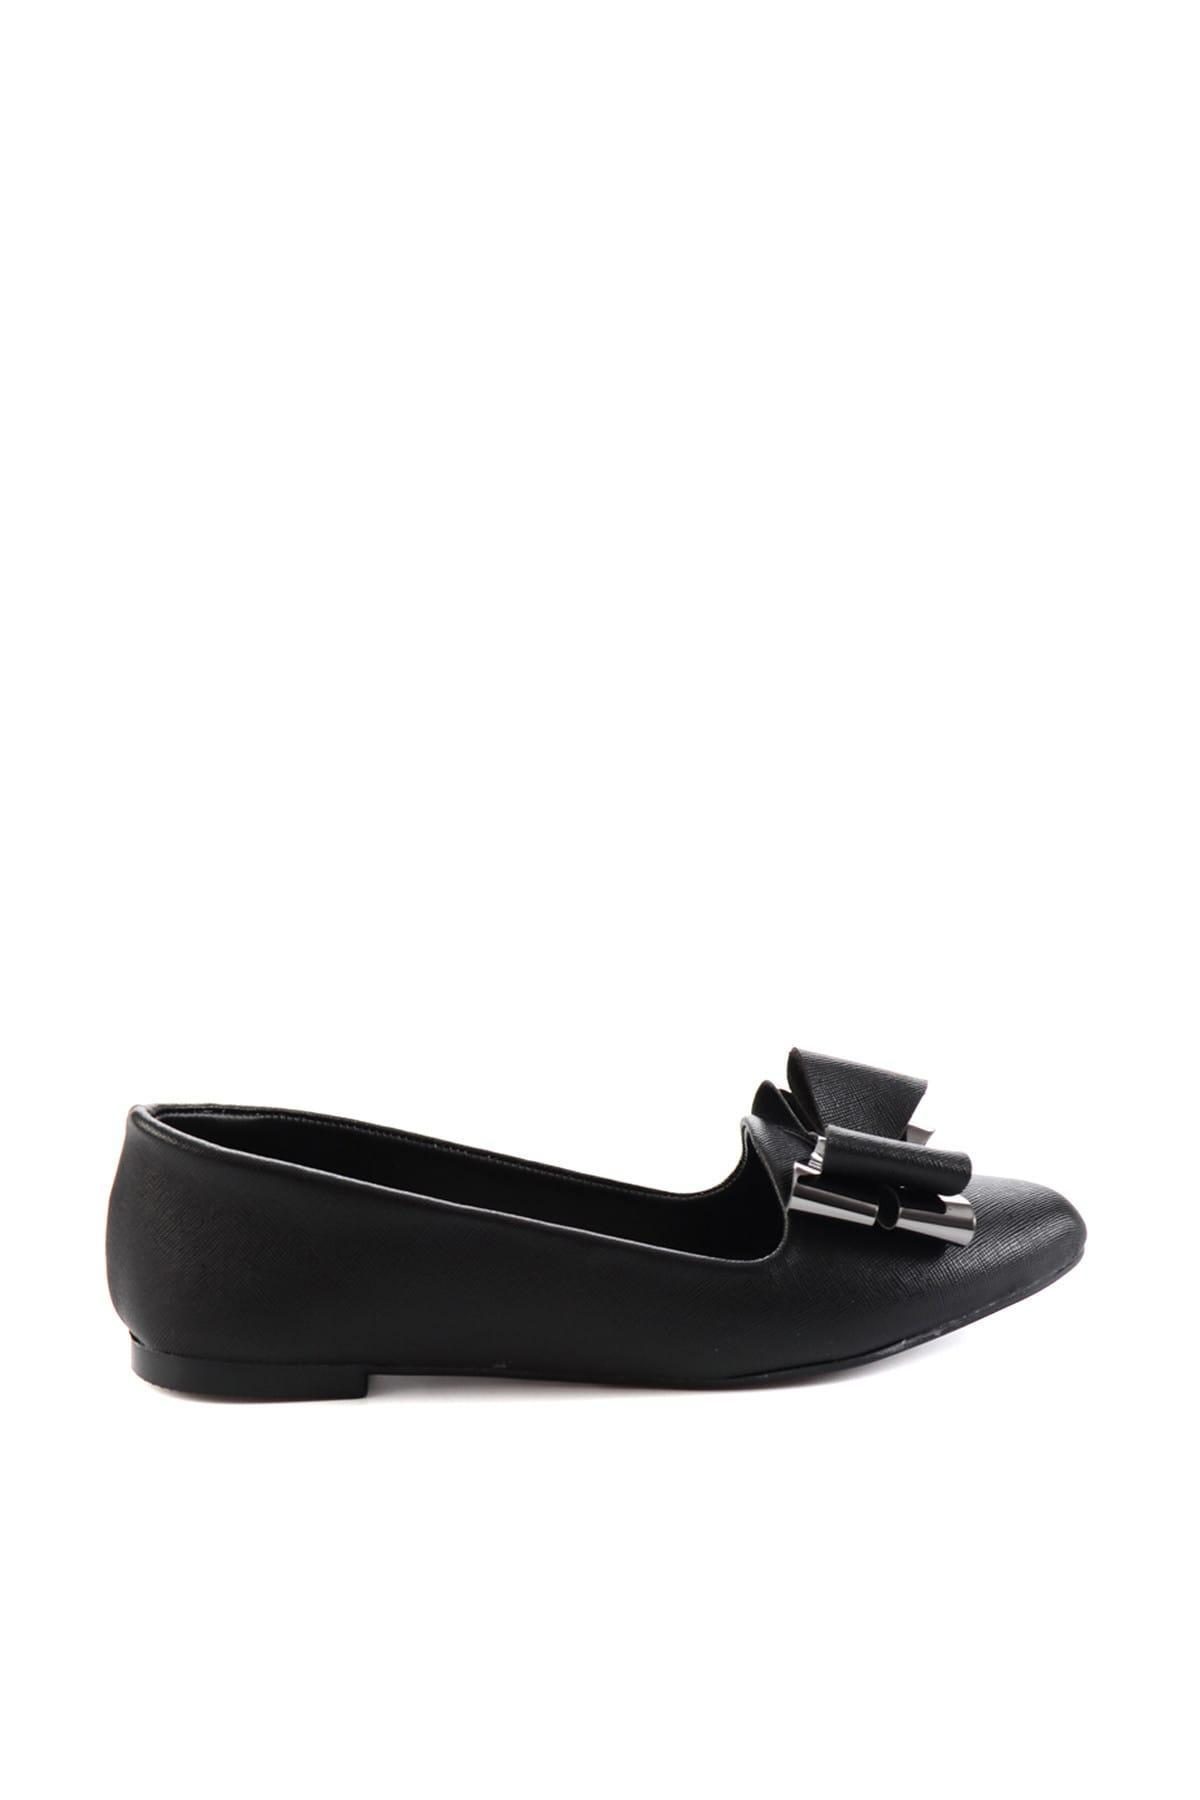 Bambi Black Women Chaussures H06261003